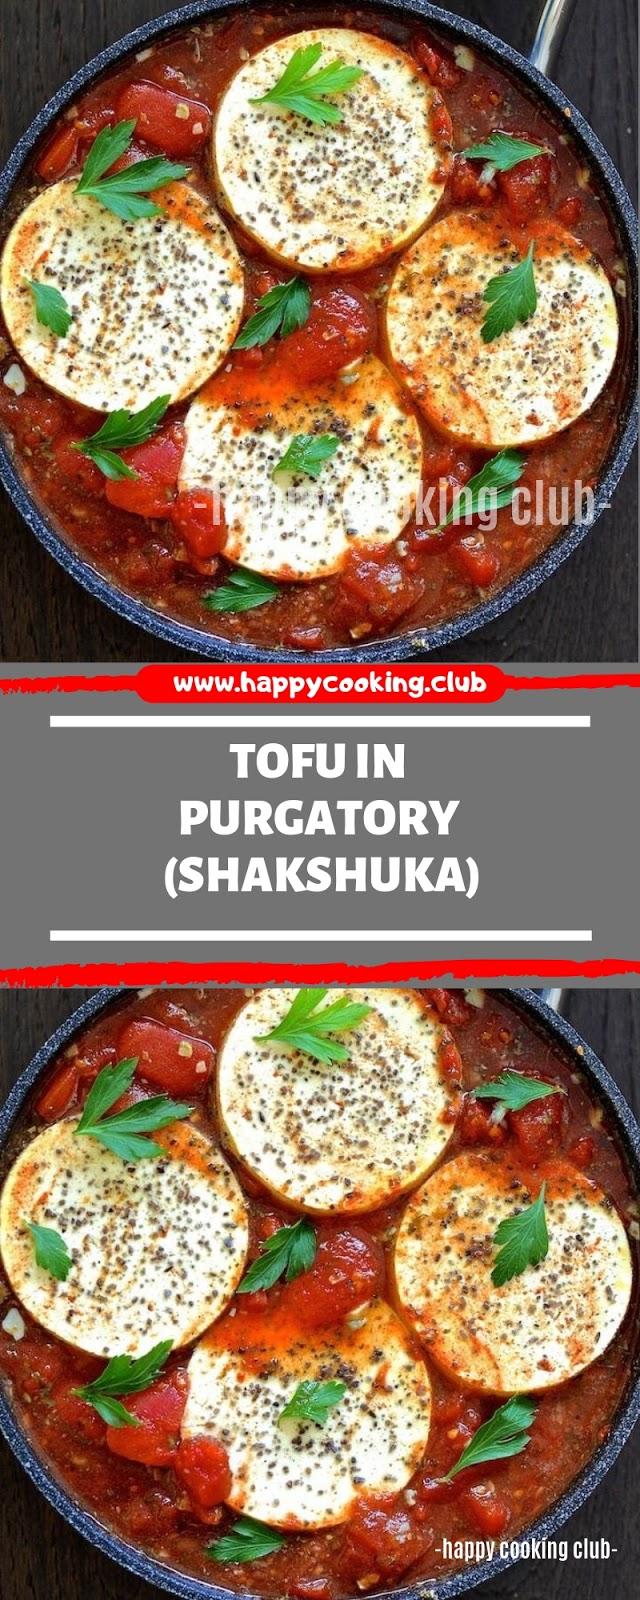 Tofu in Purgatory (Shakshuka)